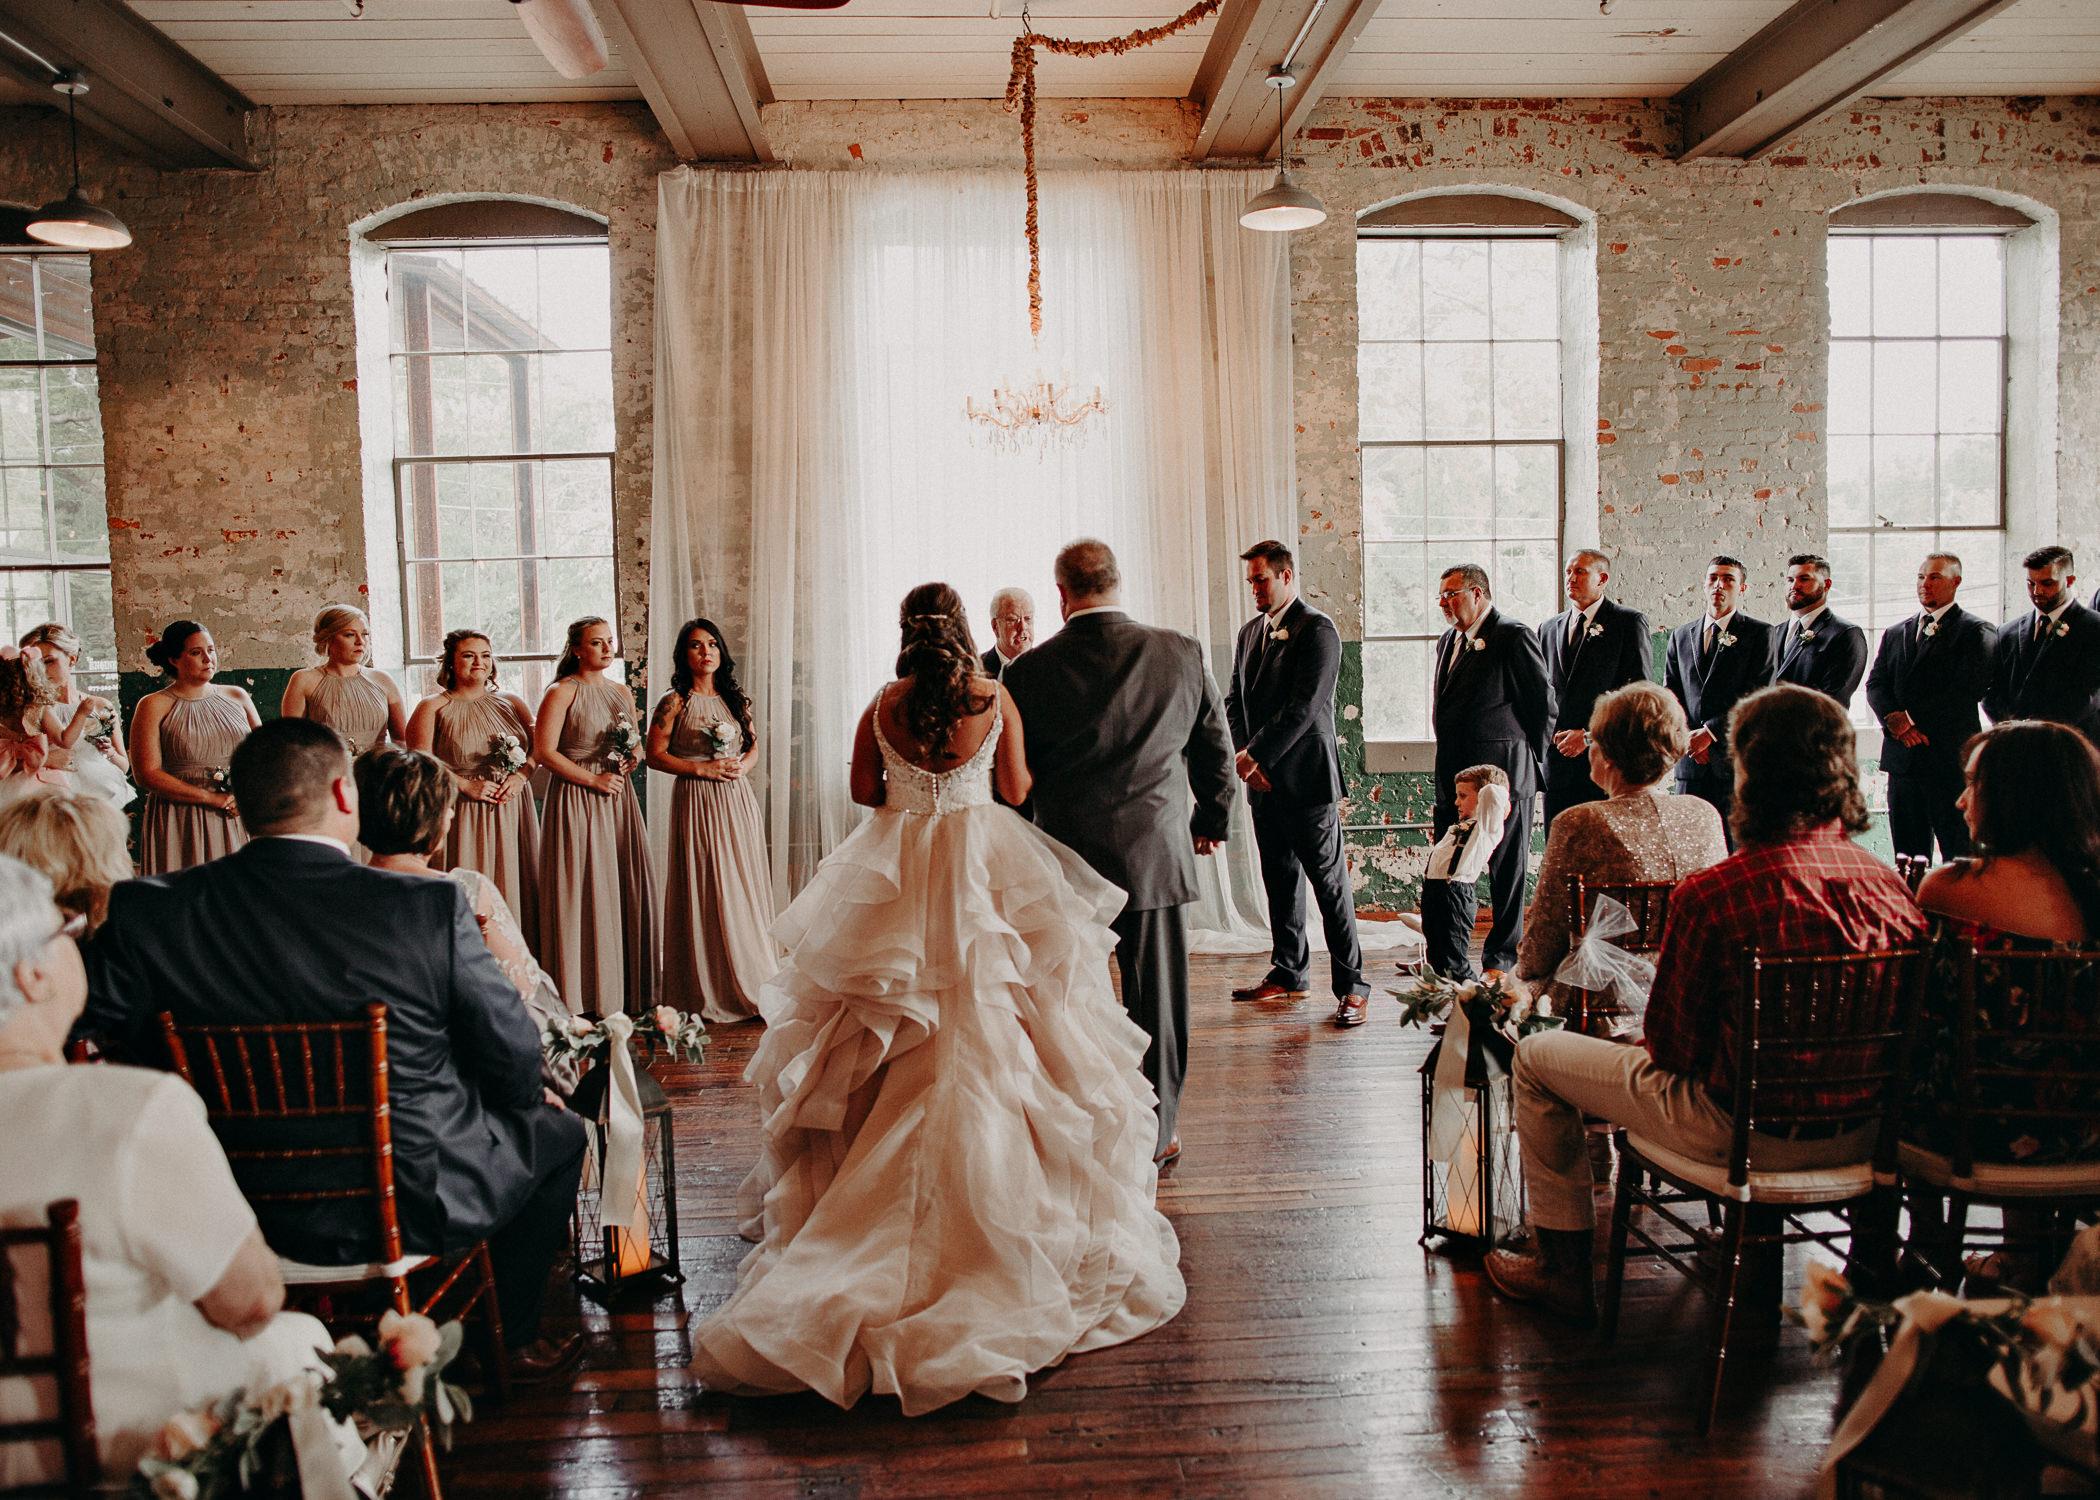 40 4 - Atlanta Wedding Photographer - The engine room - Ga - Wedding trends - Aline Marin Photography.jpg